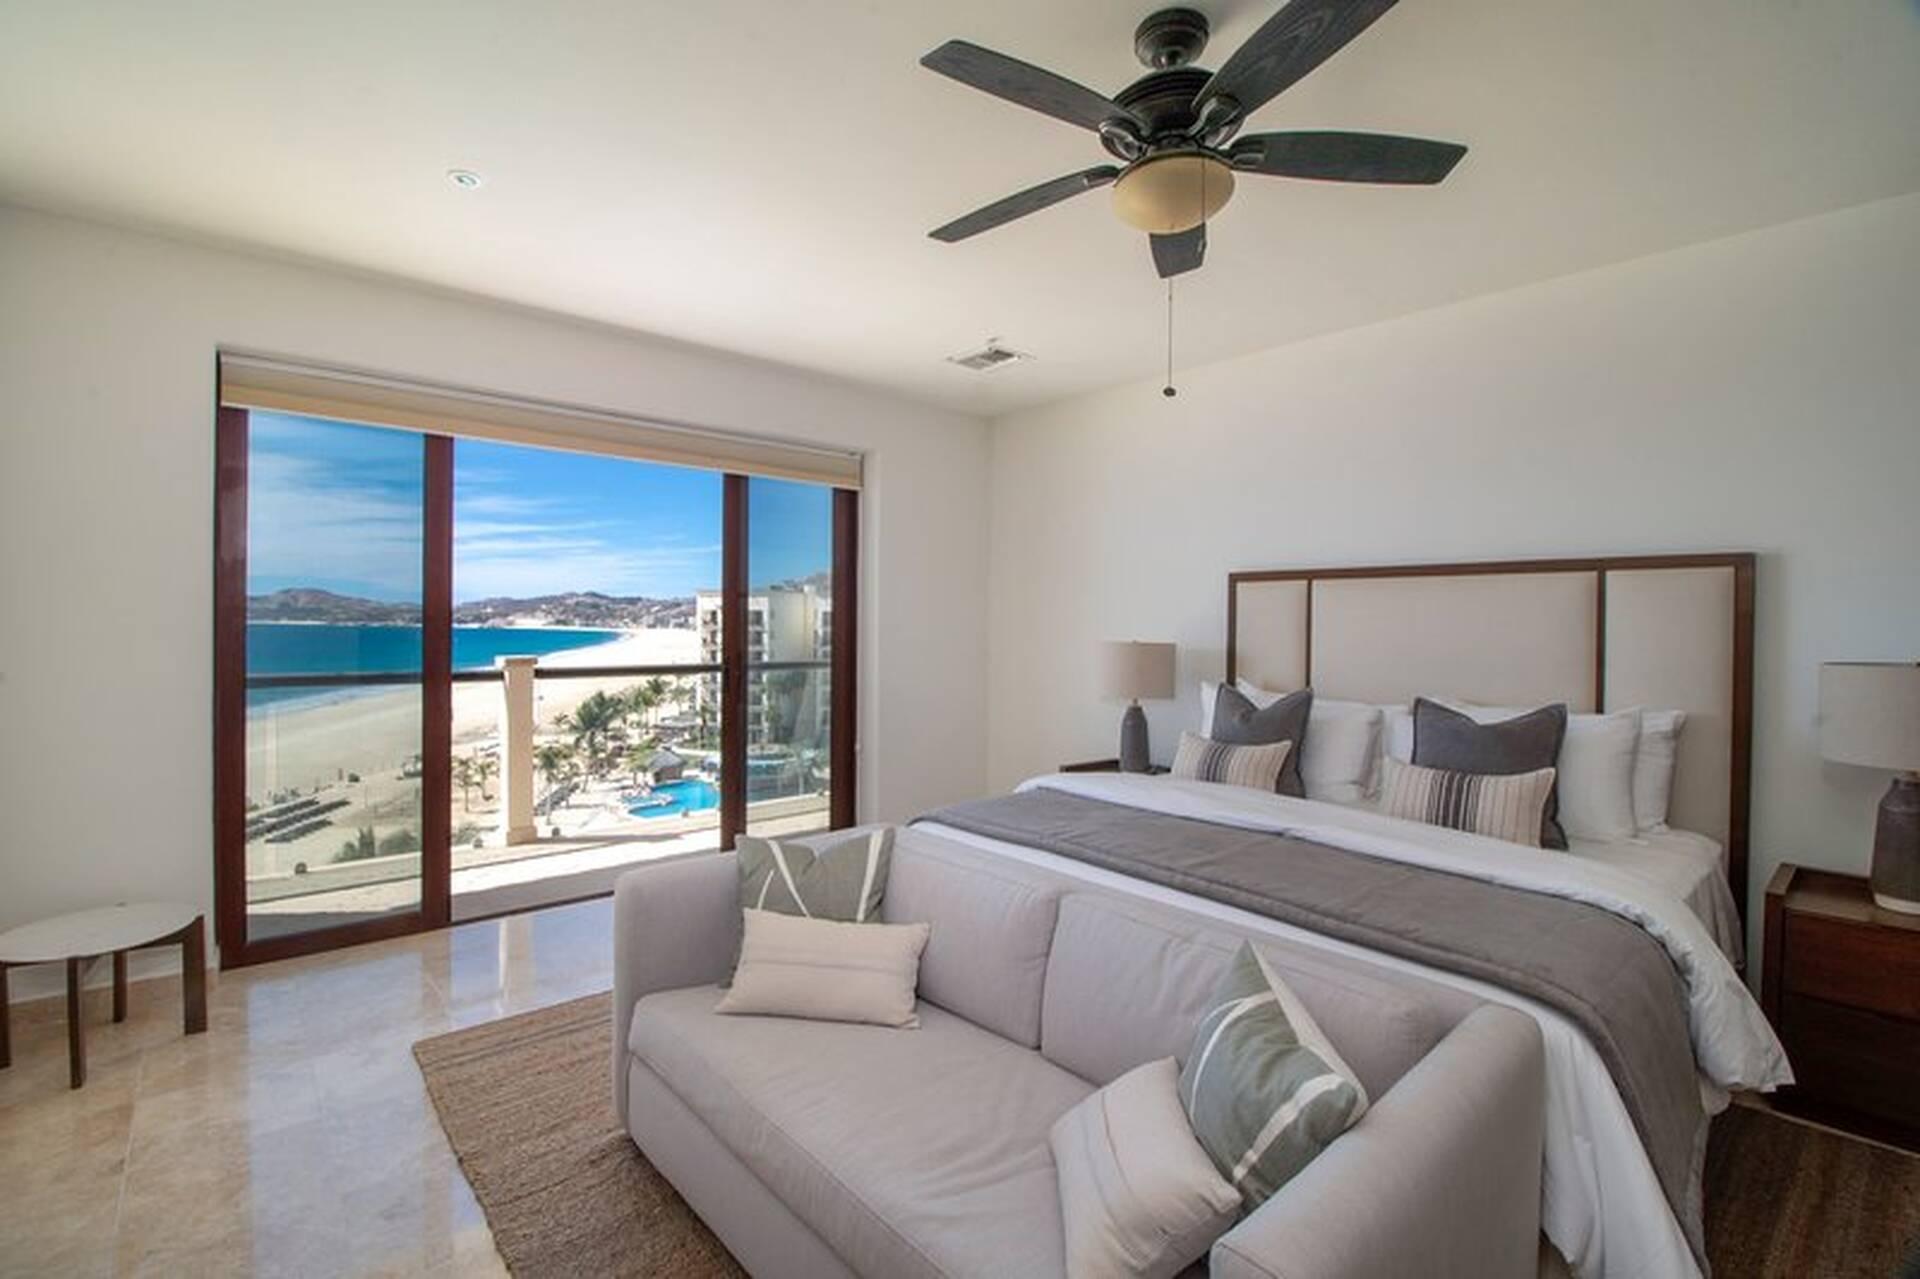 Hyatt Ziva 5 Bedroom Cabin Rental